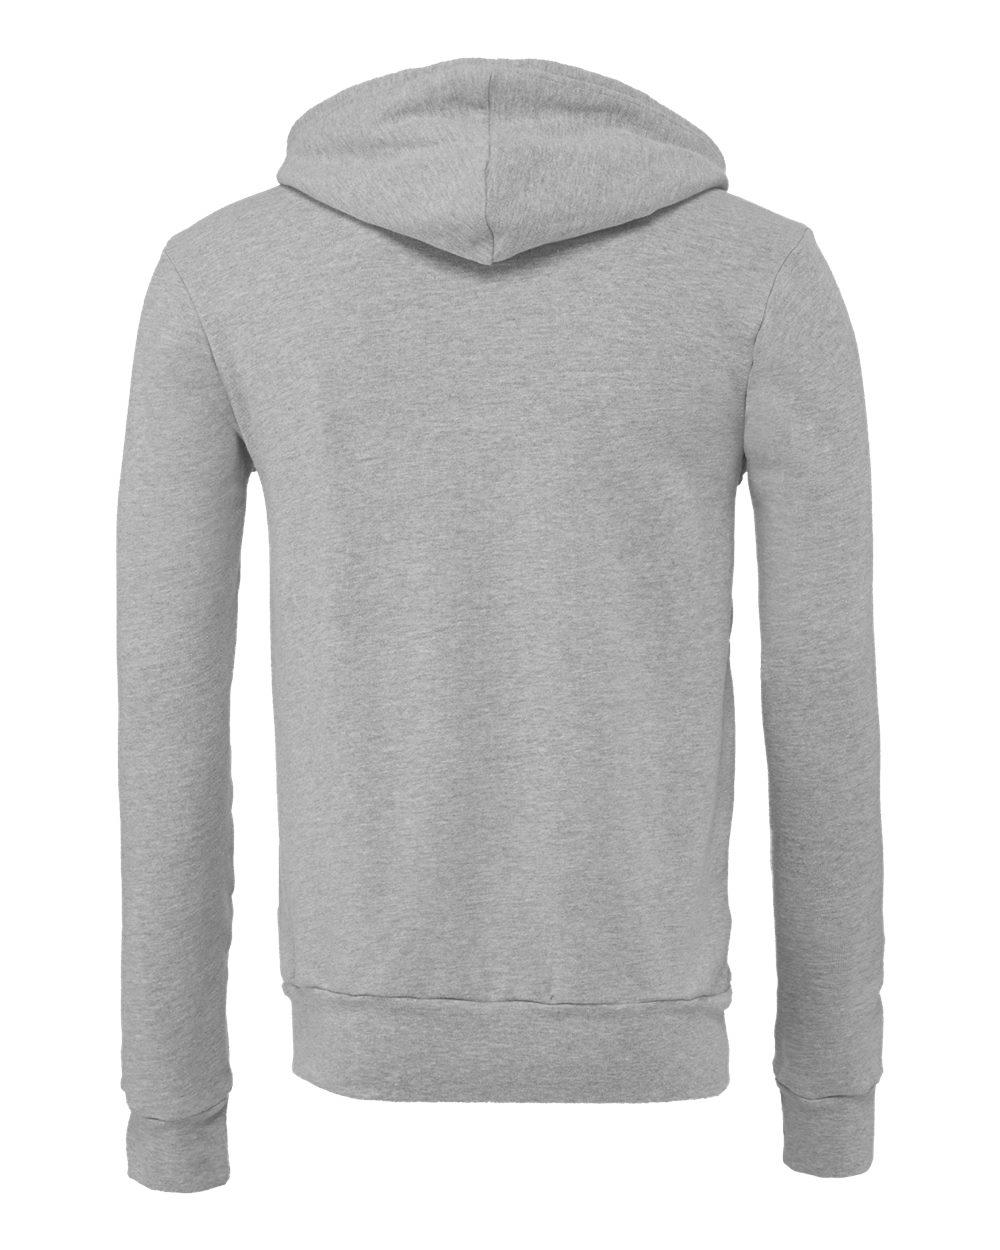 Bella-Canvas-Unisex-Full-Zip-Up-Hooded-Sweatshirt-Blank-Hoodie-3739-up-to-3XL thumbnail 9